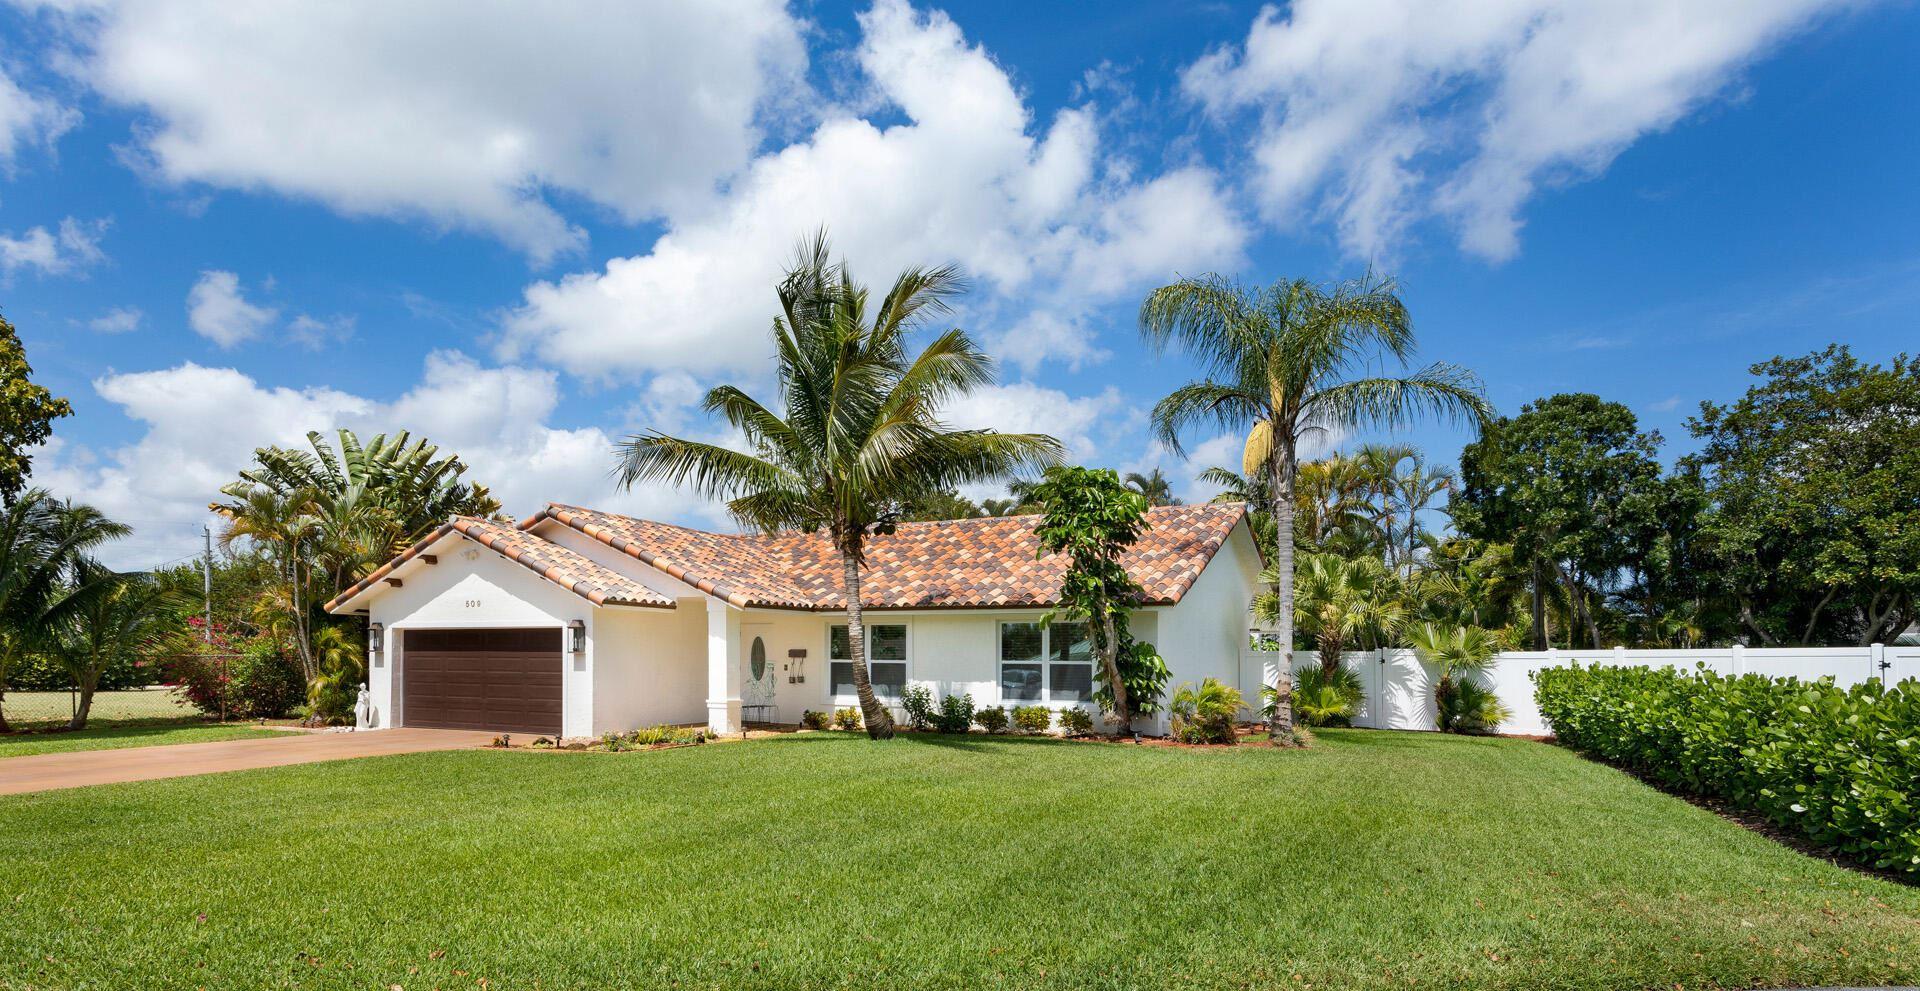 509 Eldorado Lane, Delray Beach, FL 33444 - MLS#: RX-10699087